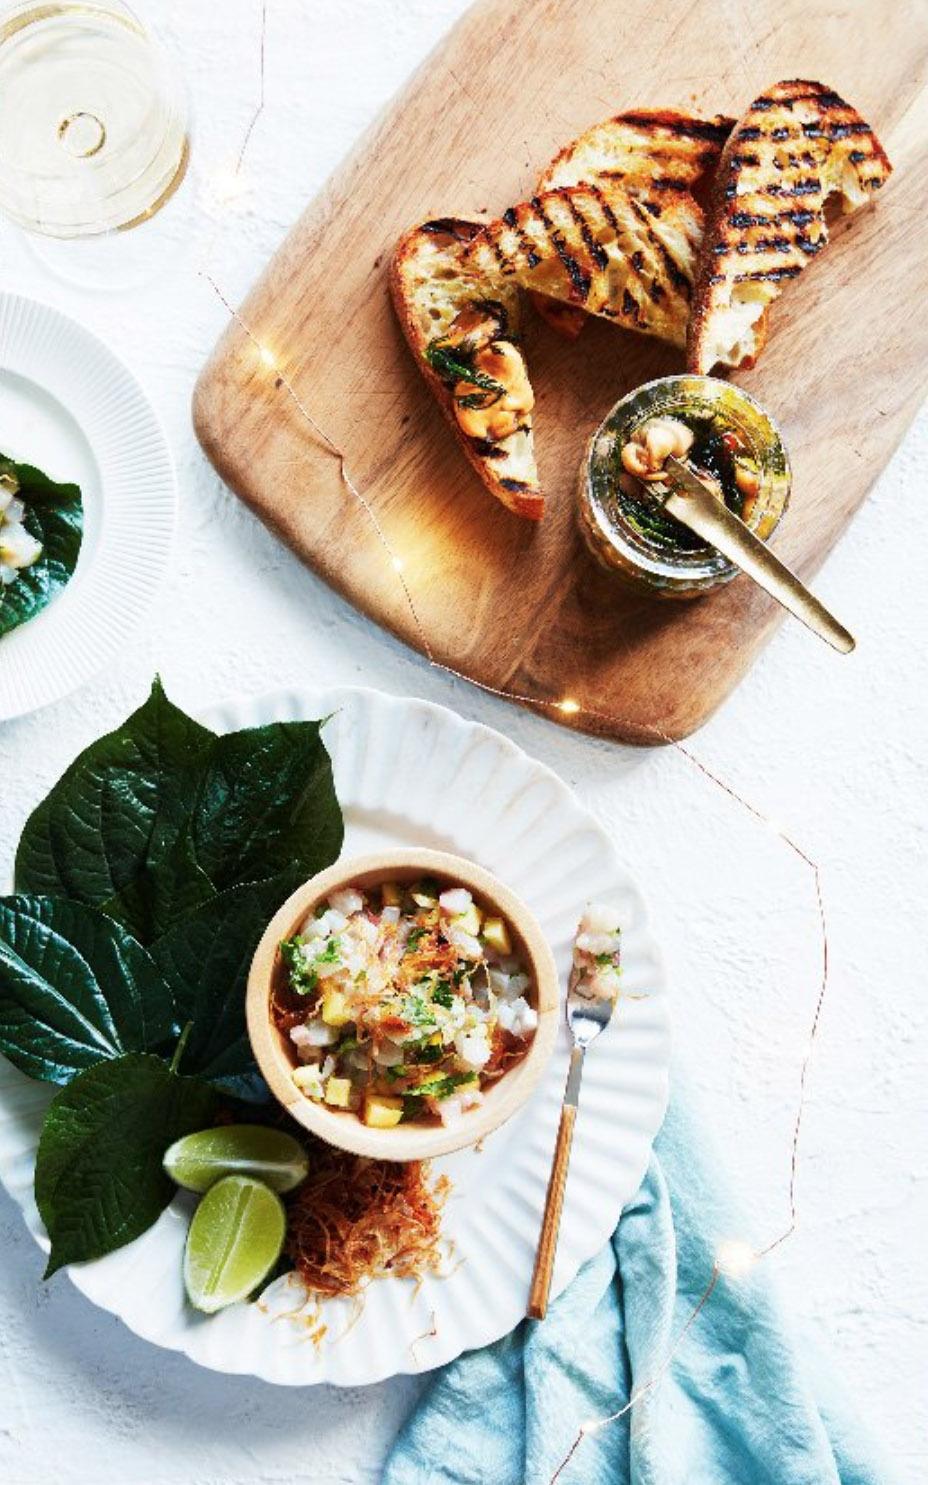 Food Styling by Kerrie-Ann Jones Interior Stylist Sydney & Melbourne.  Style Editor, Freelance Stylist.  Content Creator Sydney.  Food Stylist & Flatlay Stylist.  #foodstyling #tableinspiration #food